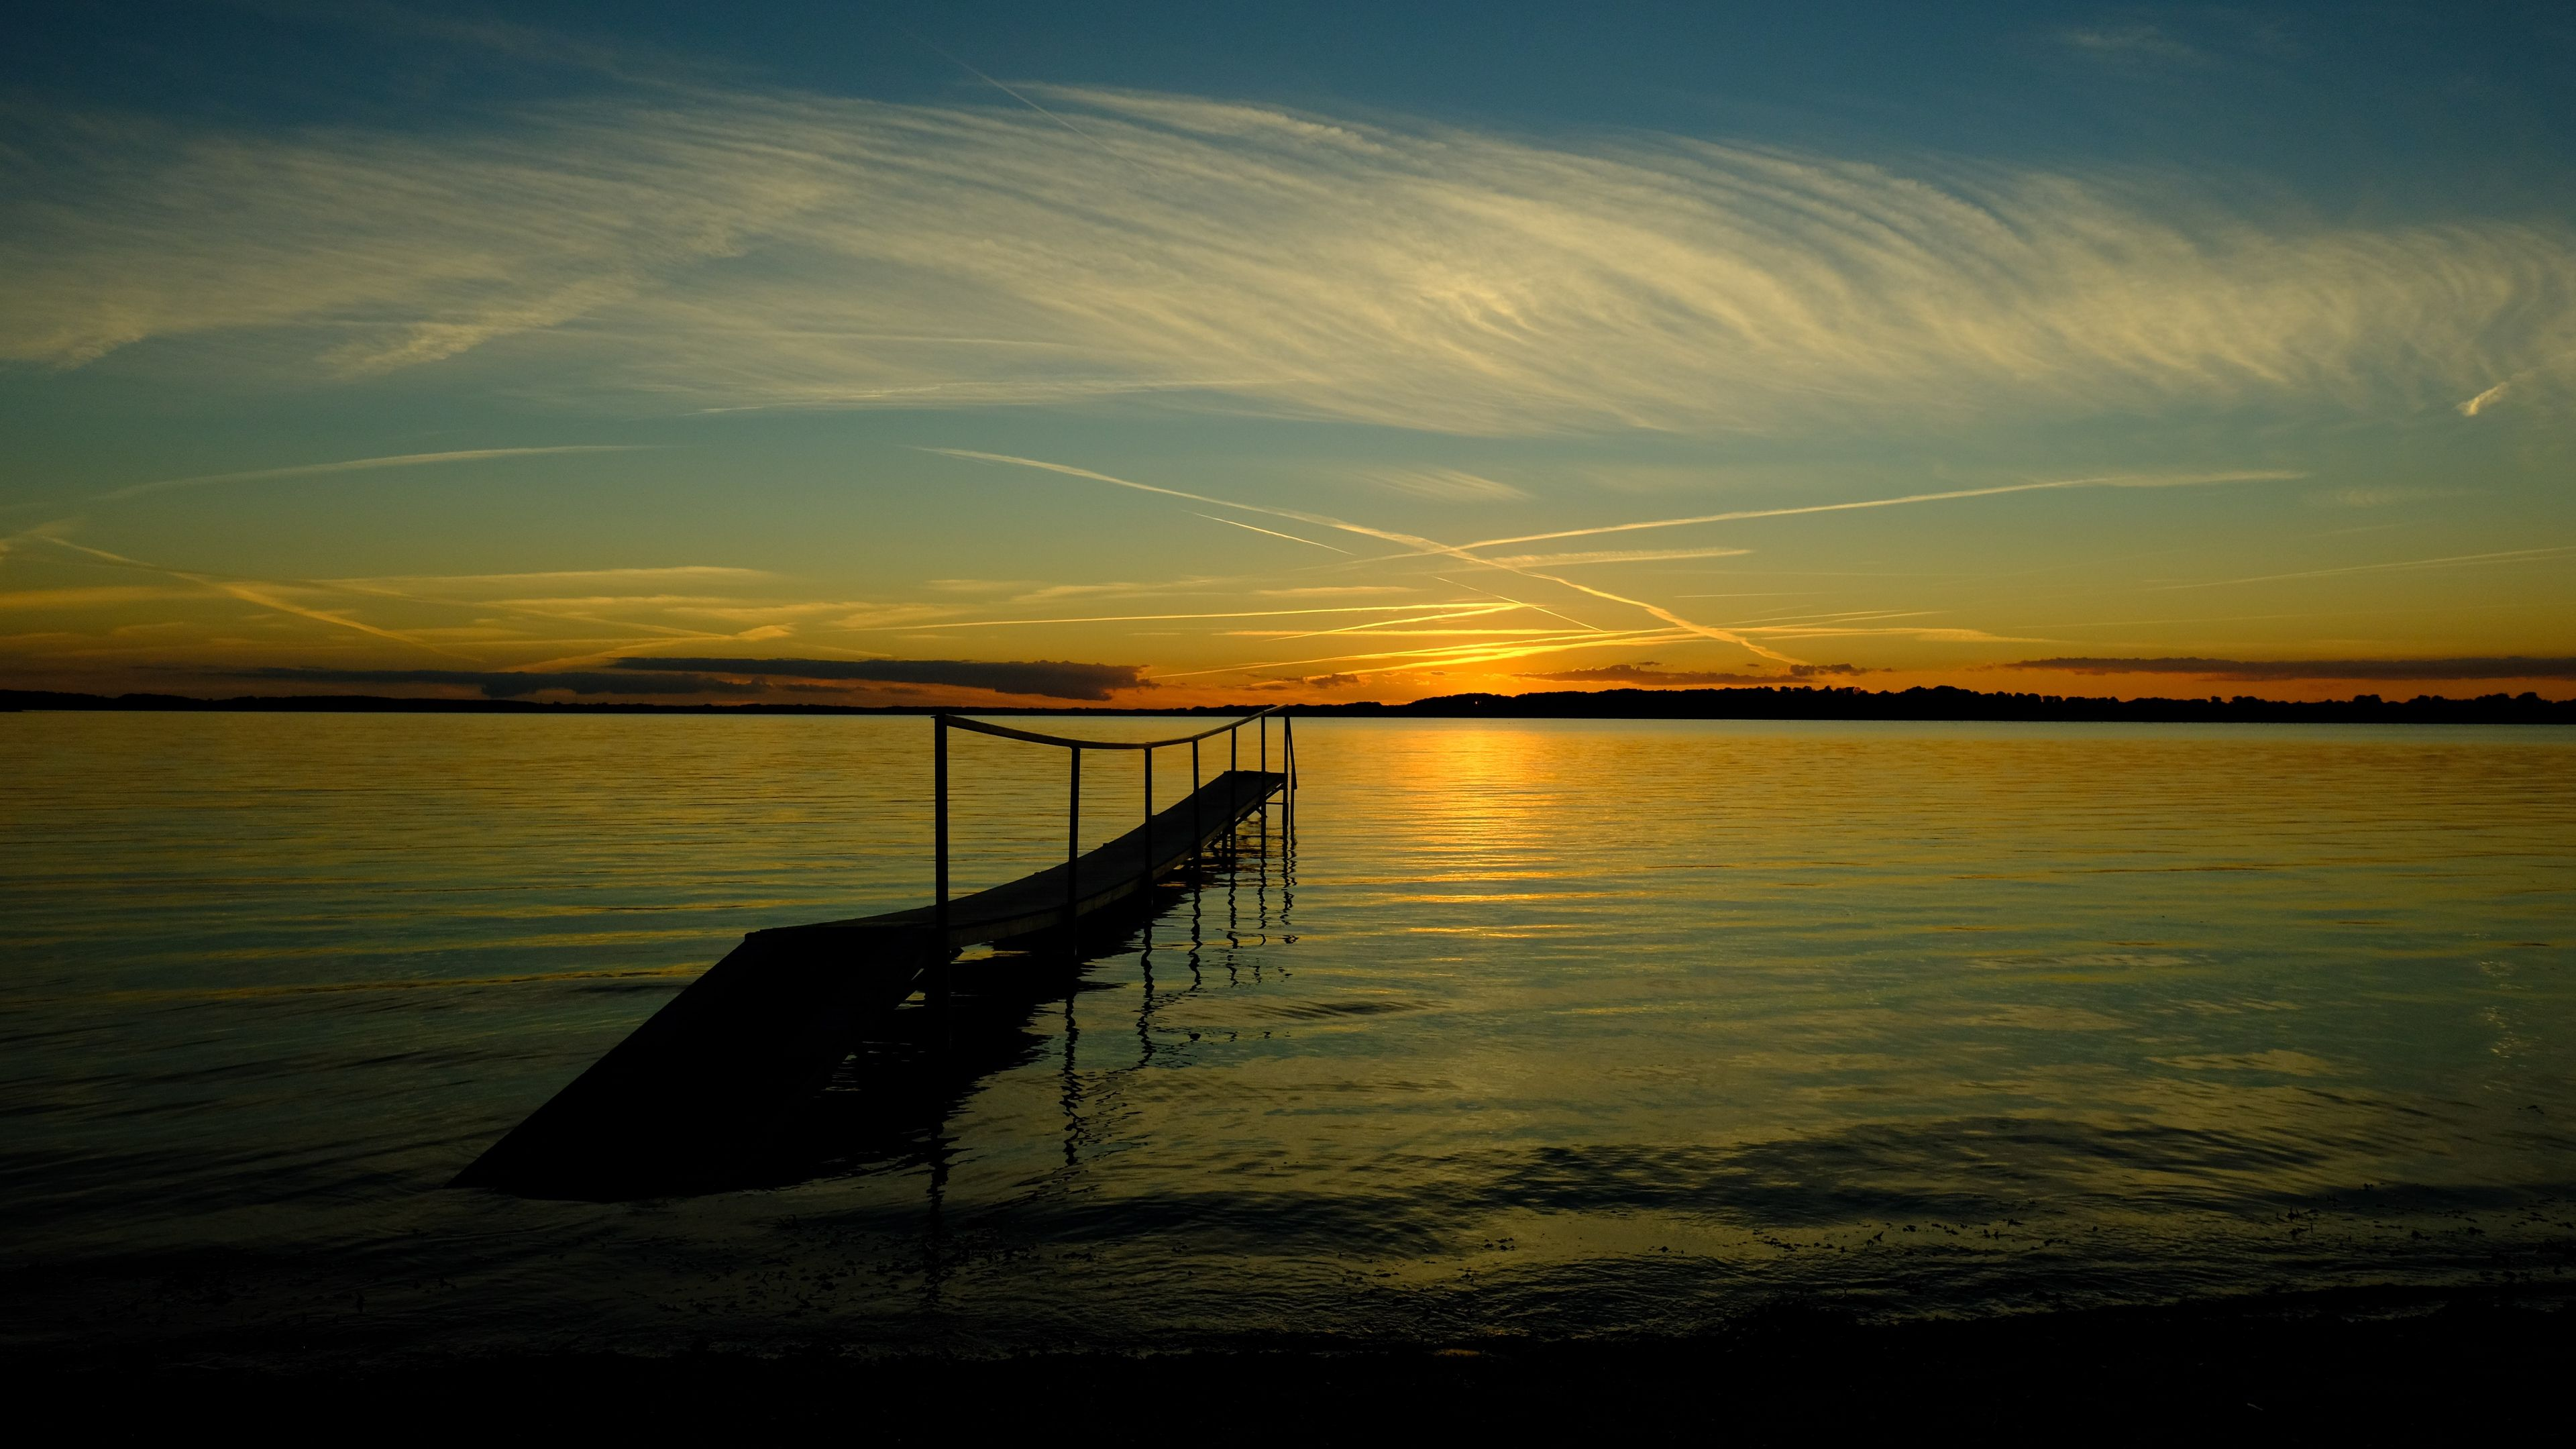 Bridge Sea Sunset Horizon River Pier Shore Sky 4k Sunset Sea Bridge Sky Sea Horizon Sunset Sunset Hd Wallpapers